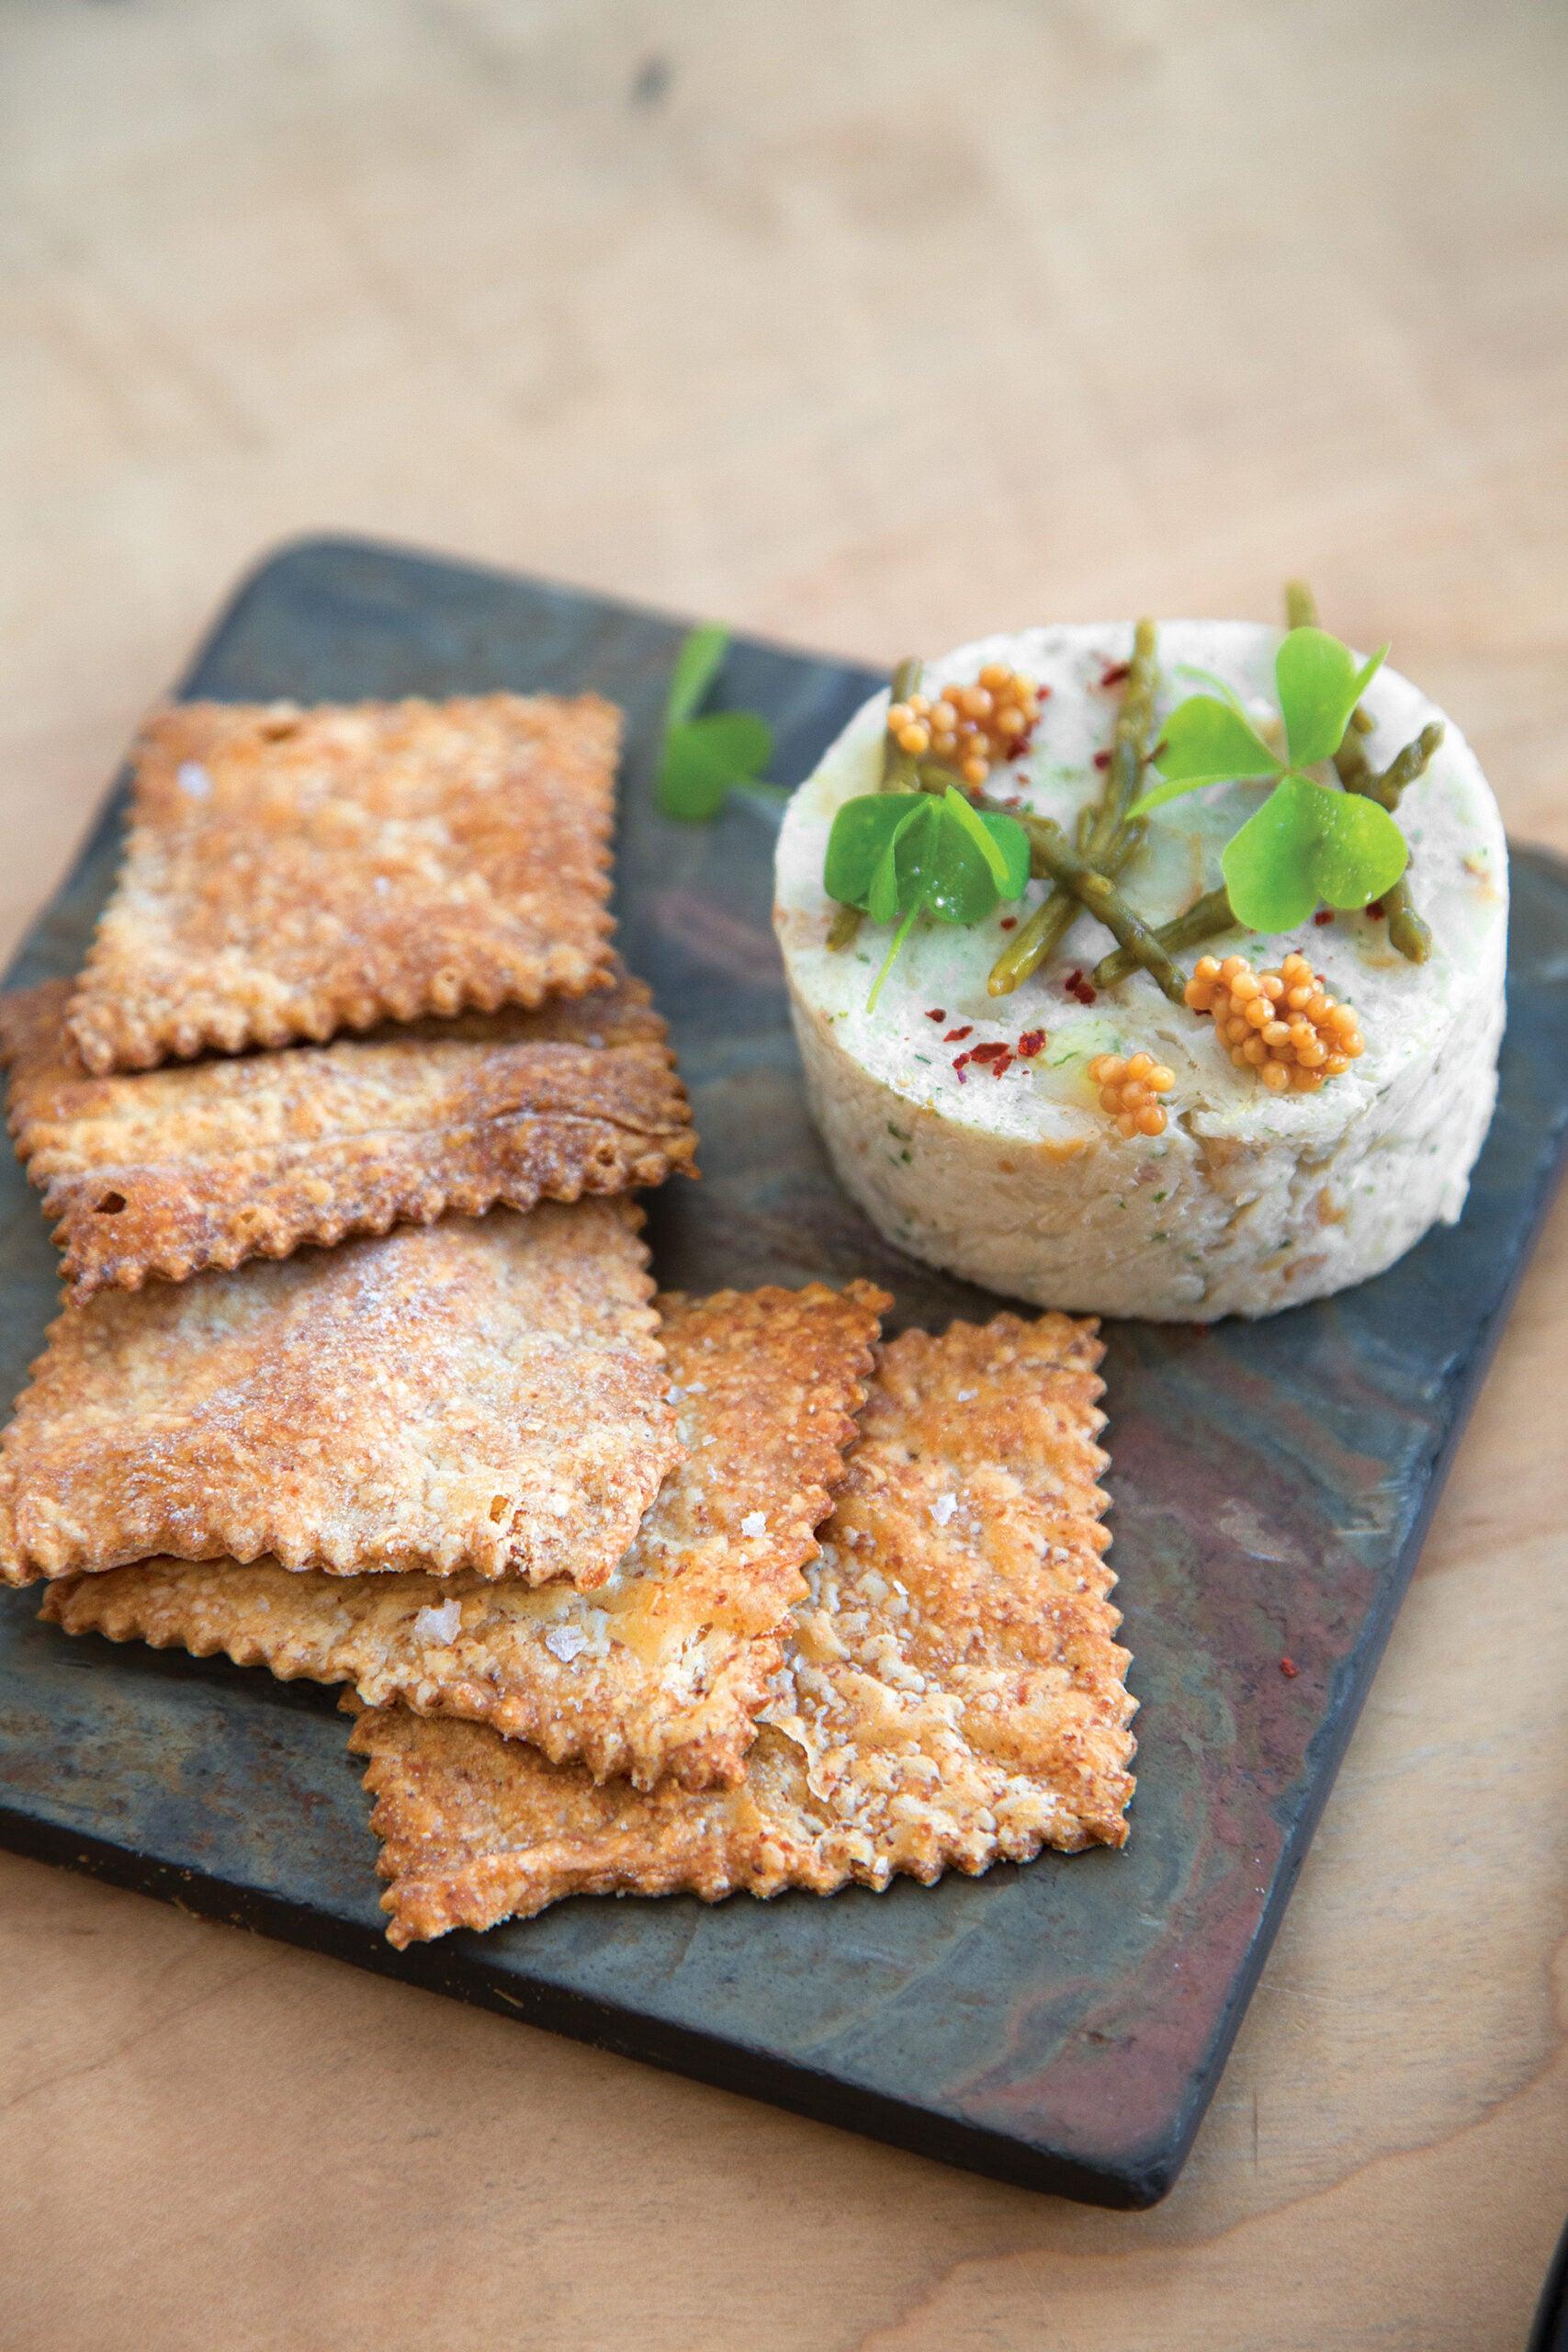 Smoked Bluefish Pâté with Hardtack Crackers